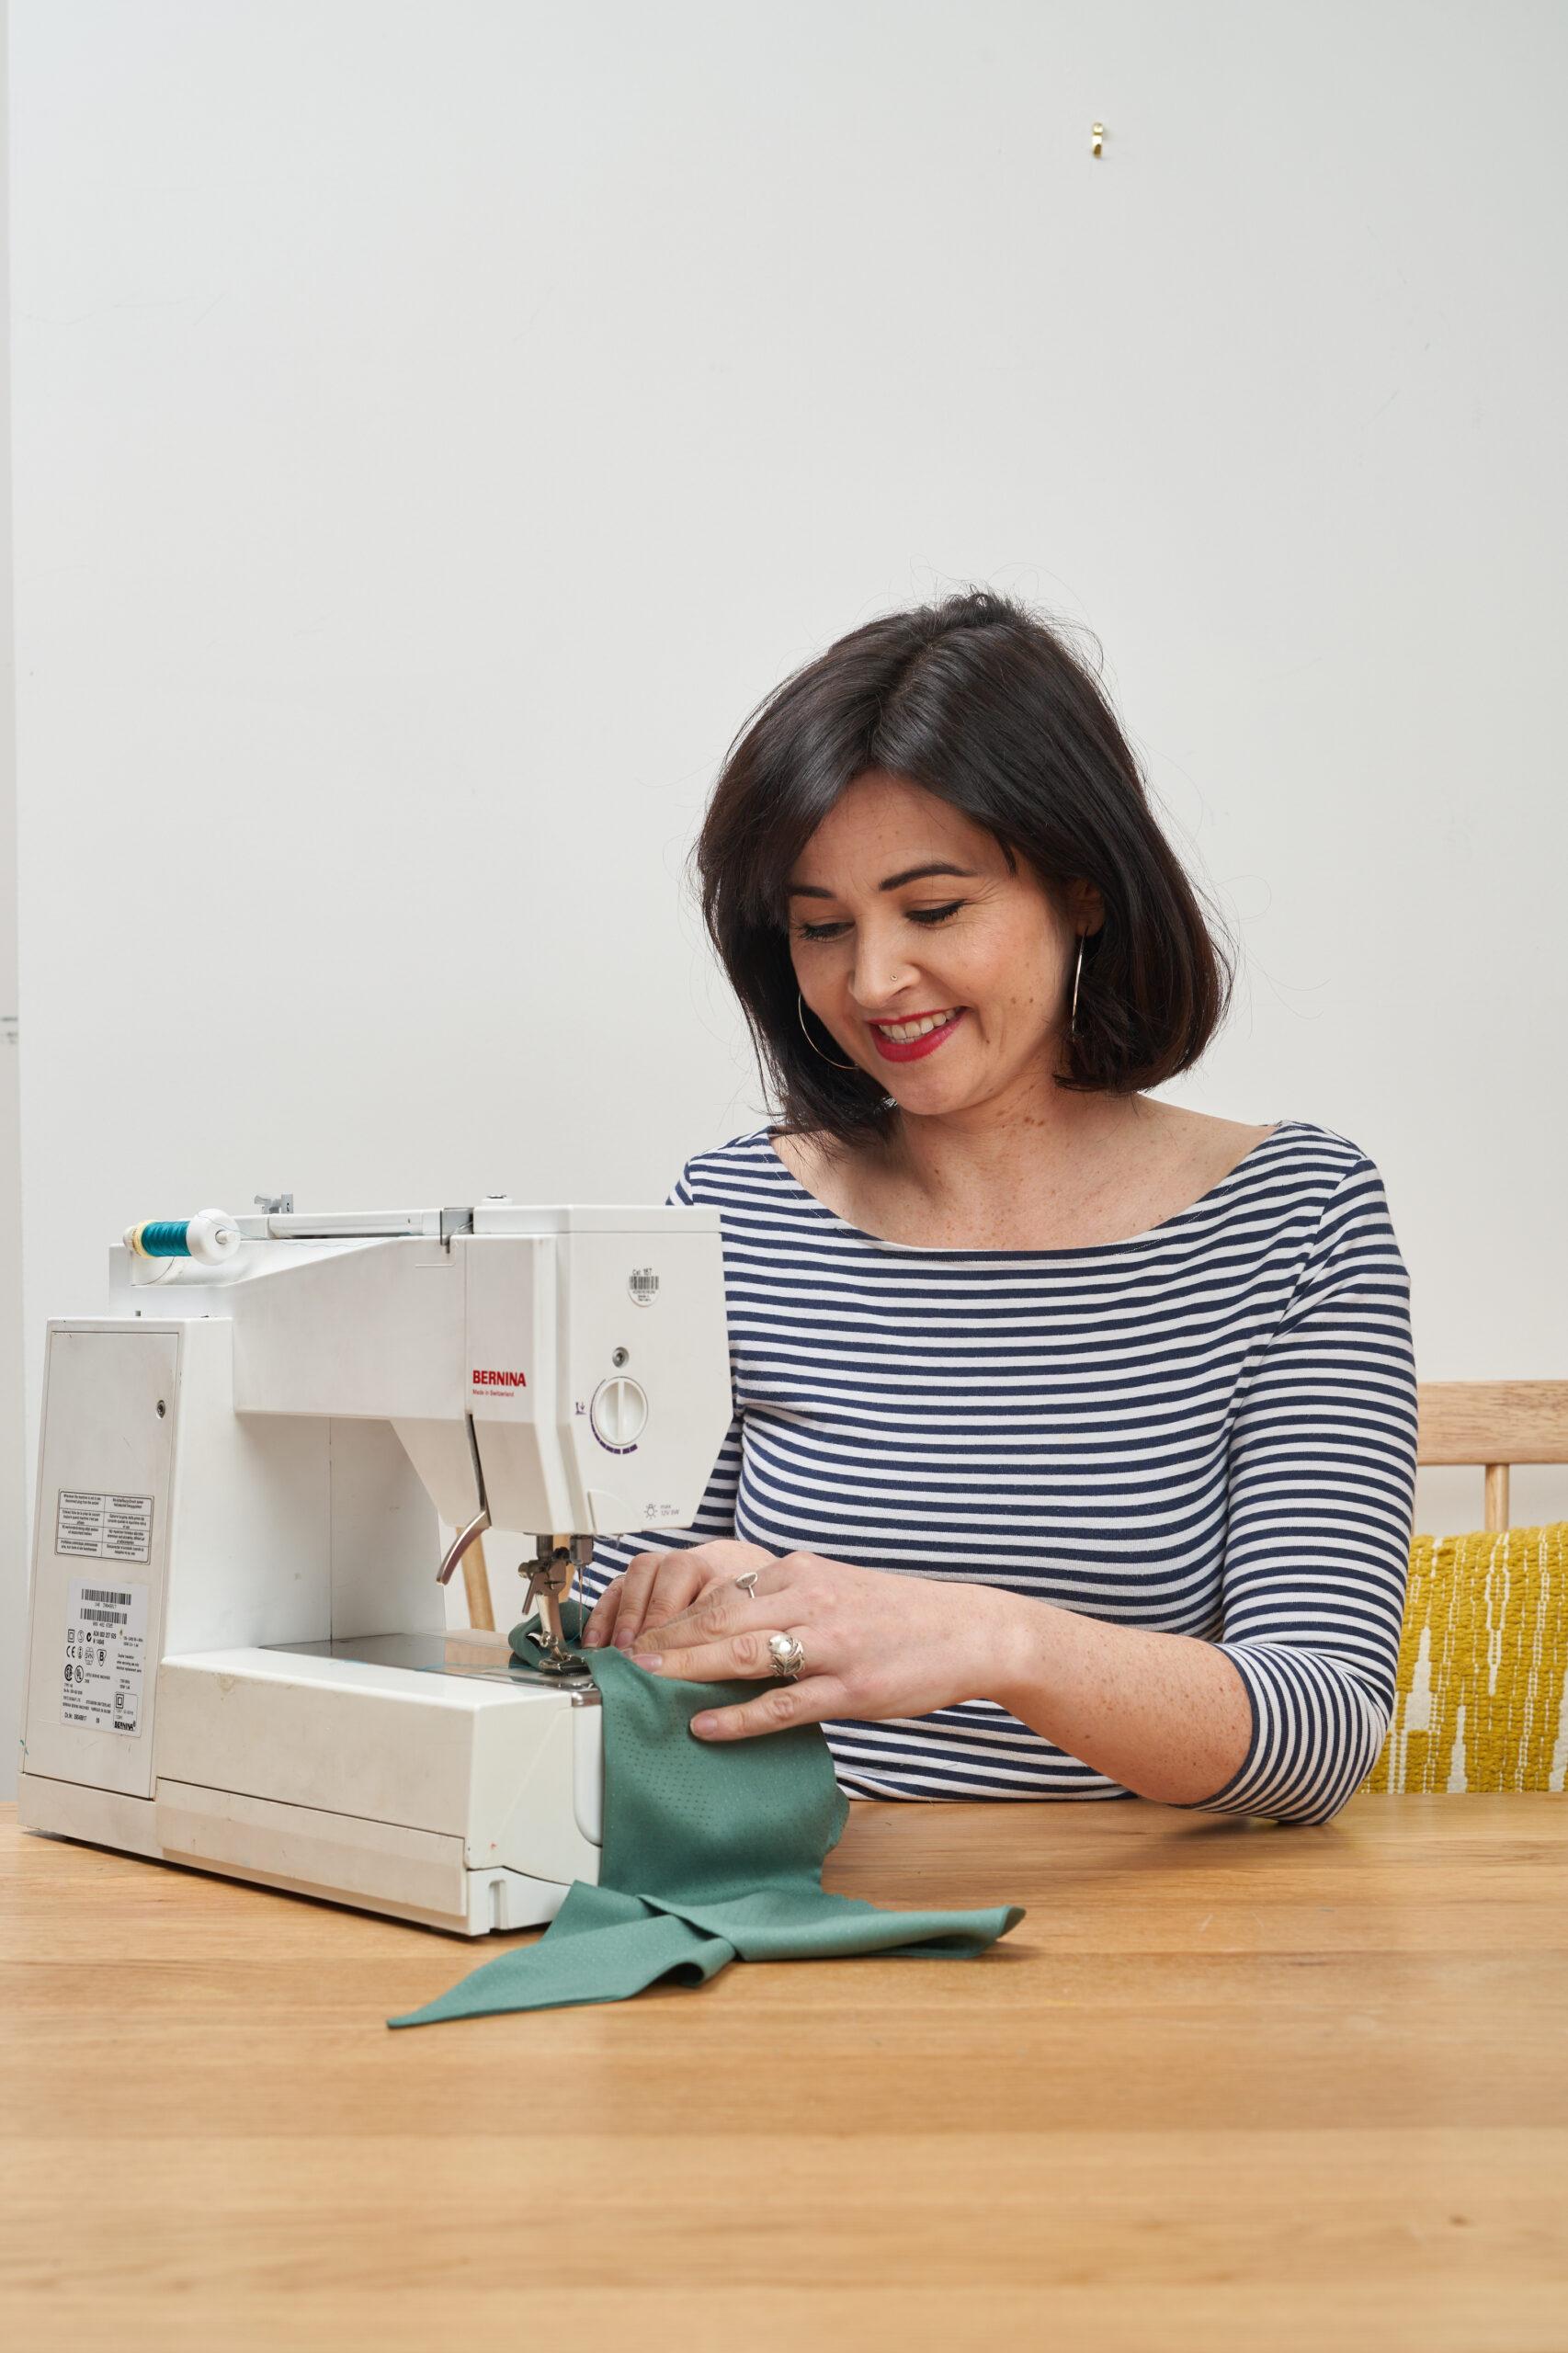 Sew Over It - Lisa